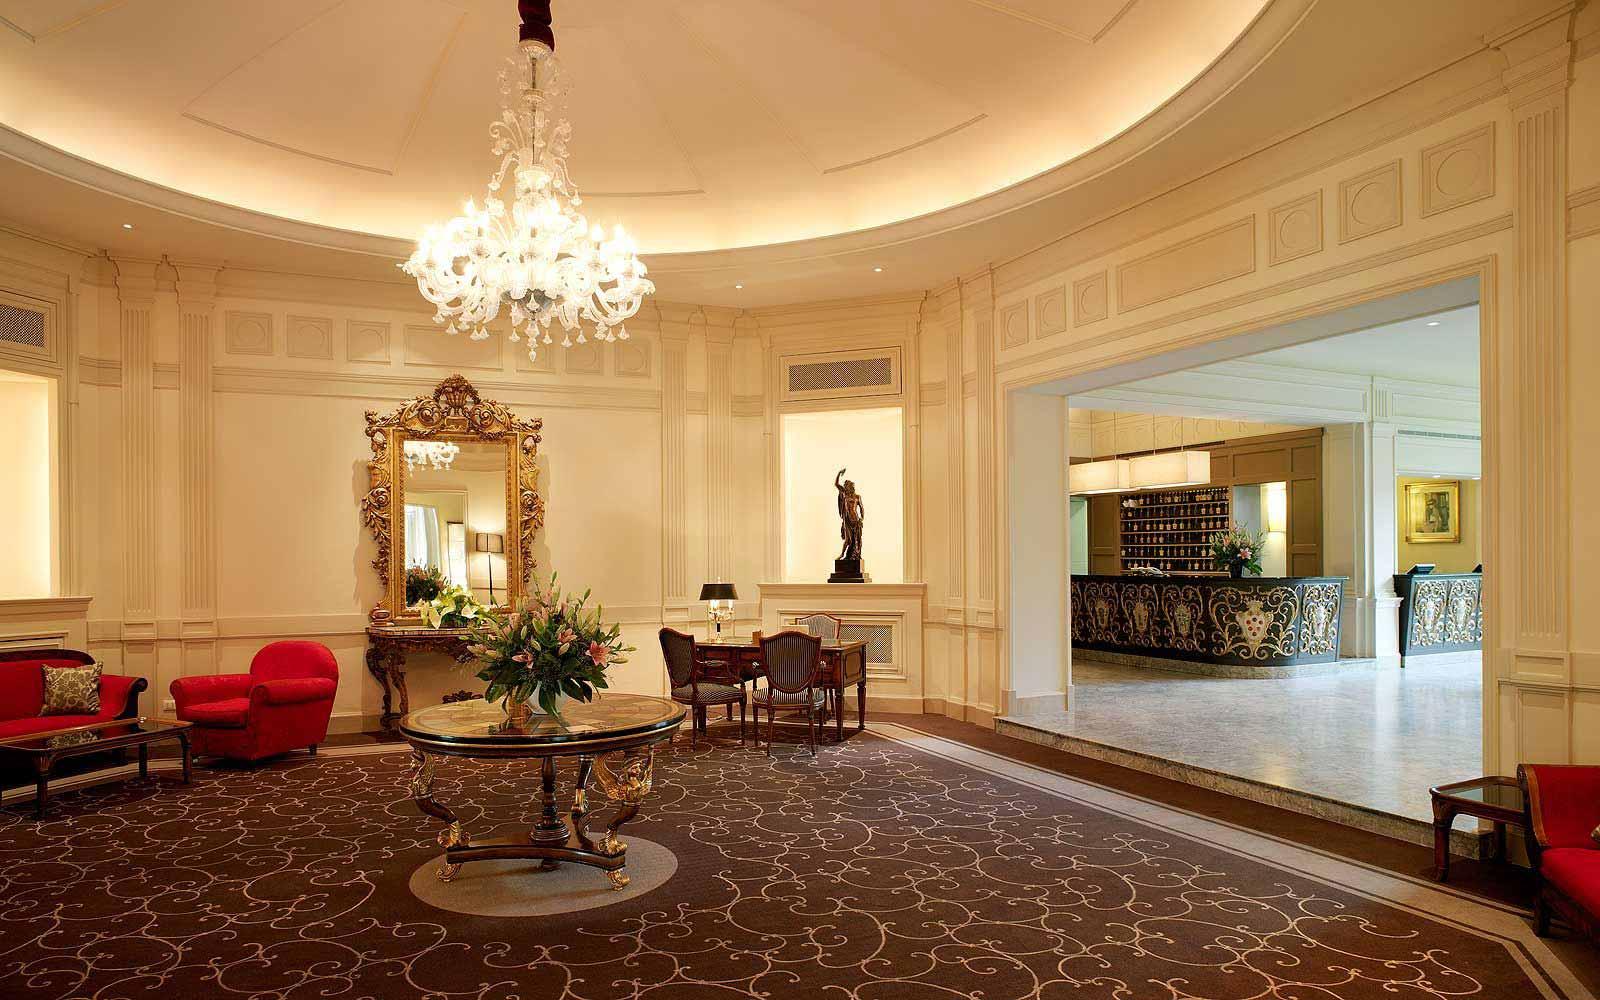 grand hotel villa medici florence cities italy grand. Black Bedroom Furniture Sets. Home Design Ideas